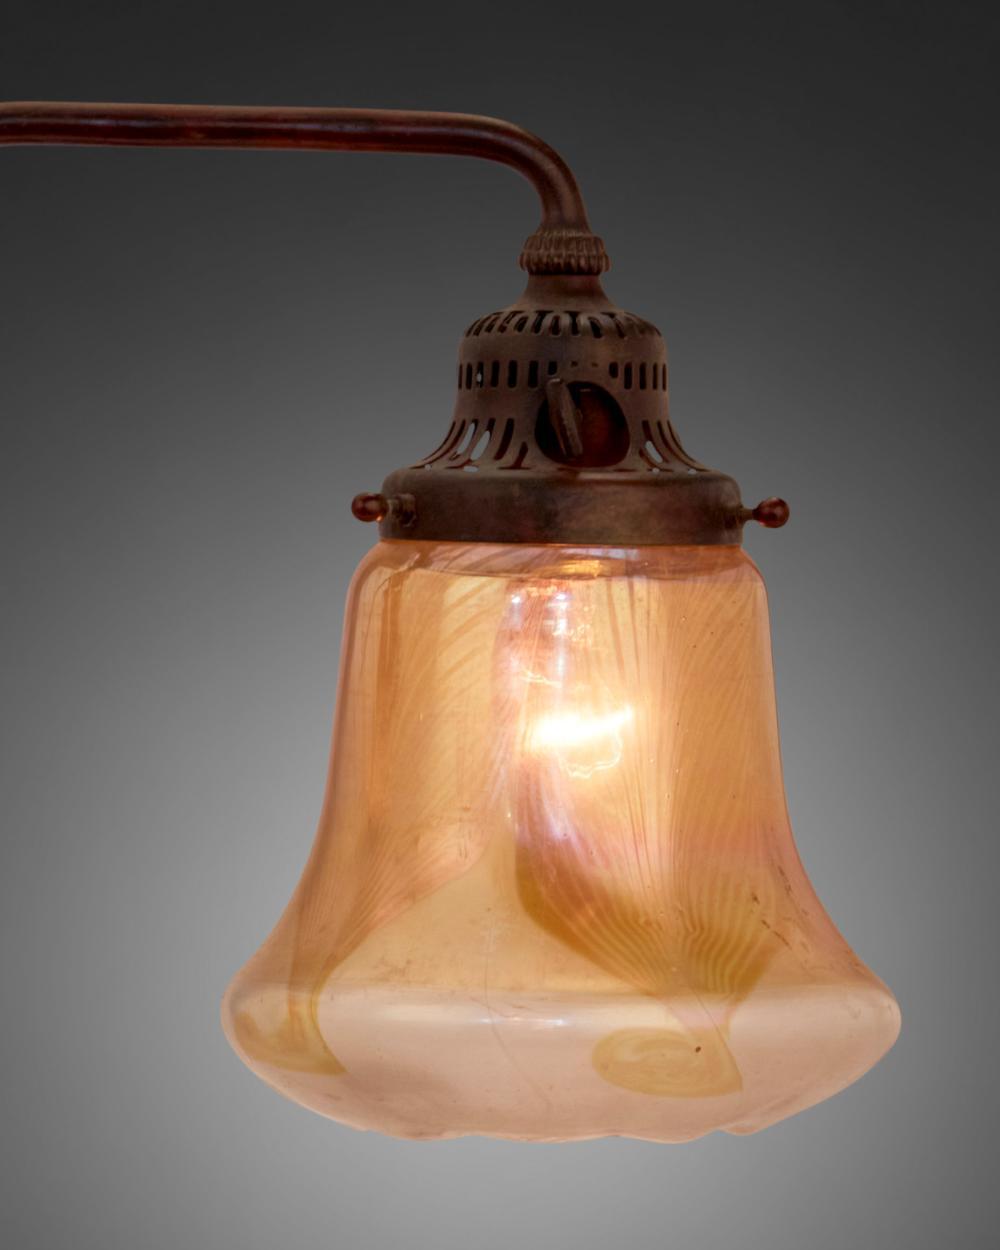 A Tiffany Studios double-arm table lamp